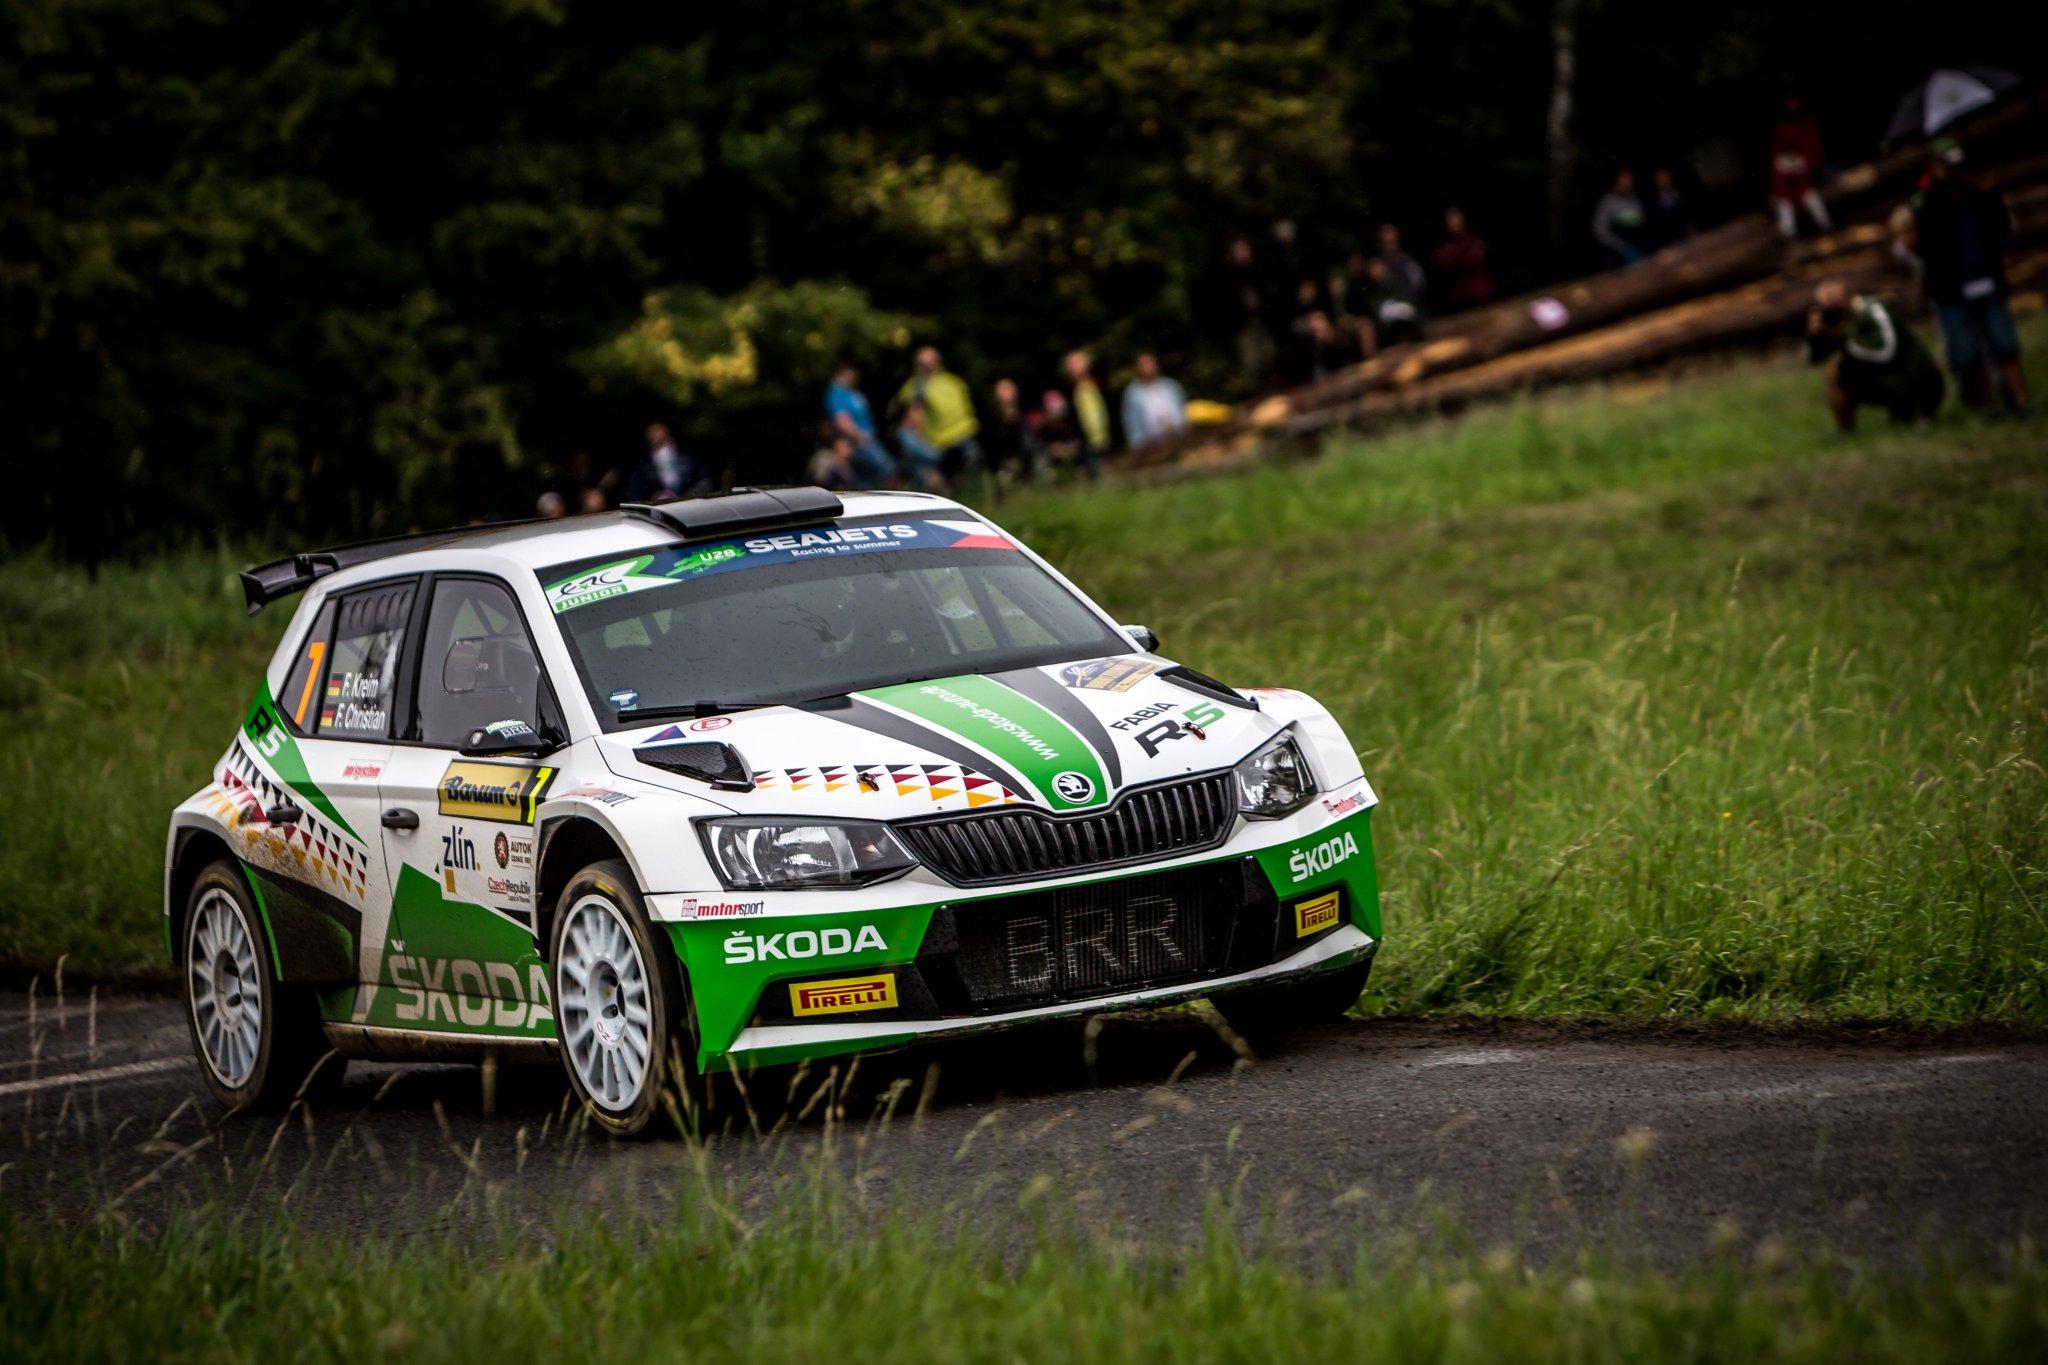 Rally Barum 2018 ERC - Página 3 DlhmVP6XgAYGyAc